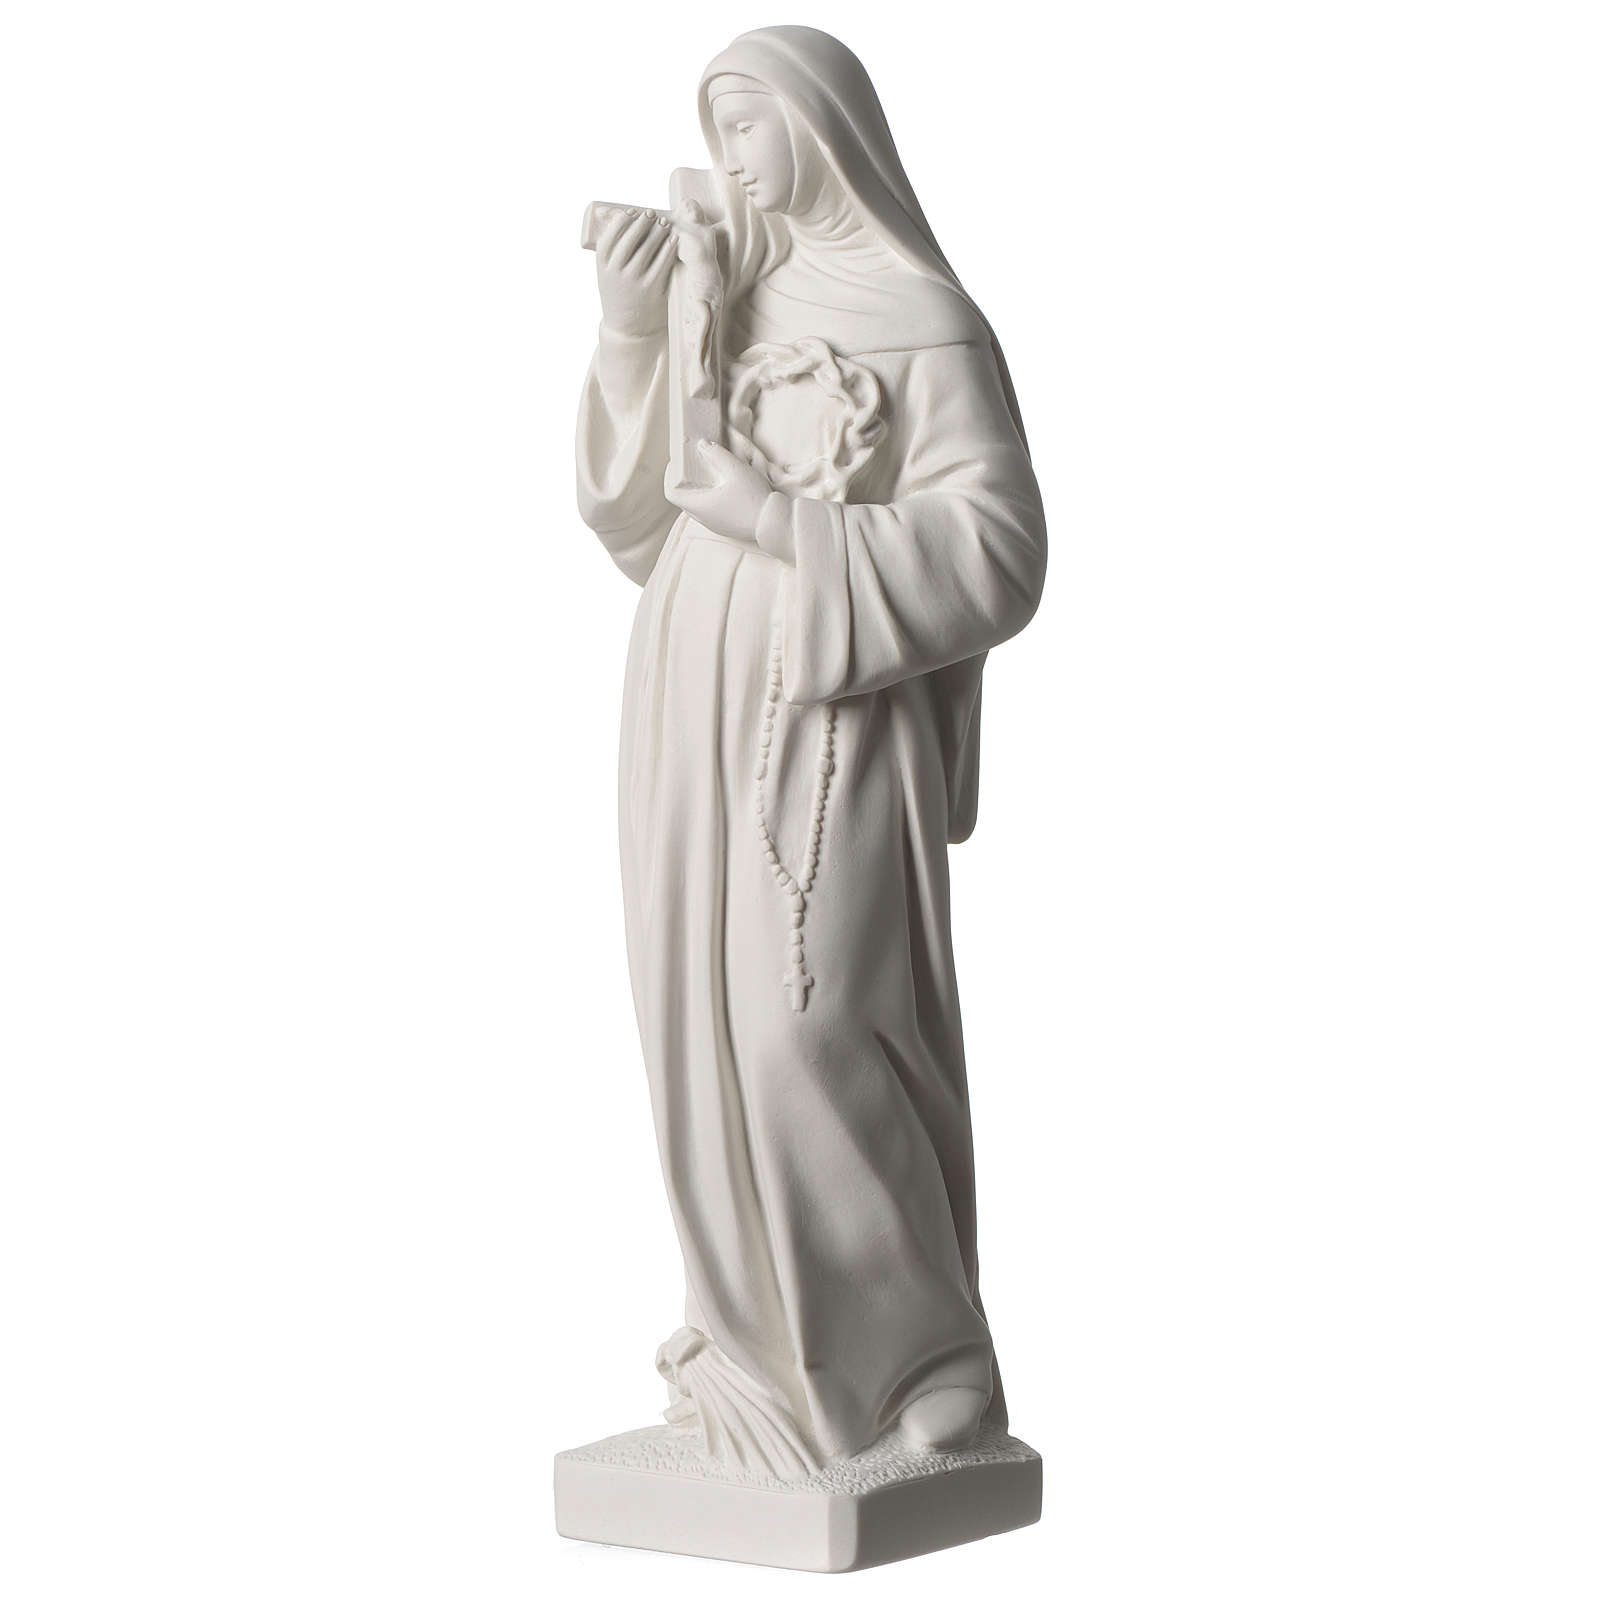 Statue Sainte Rita poudre de marbre blanc 39 cm 4